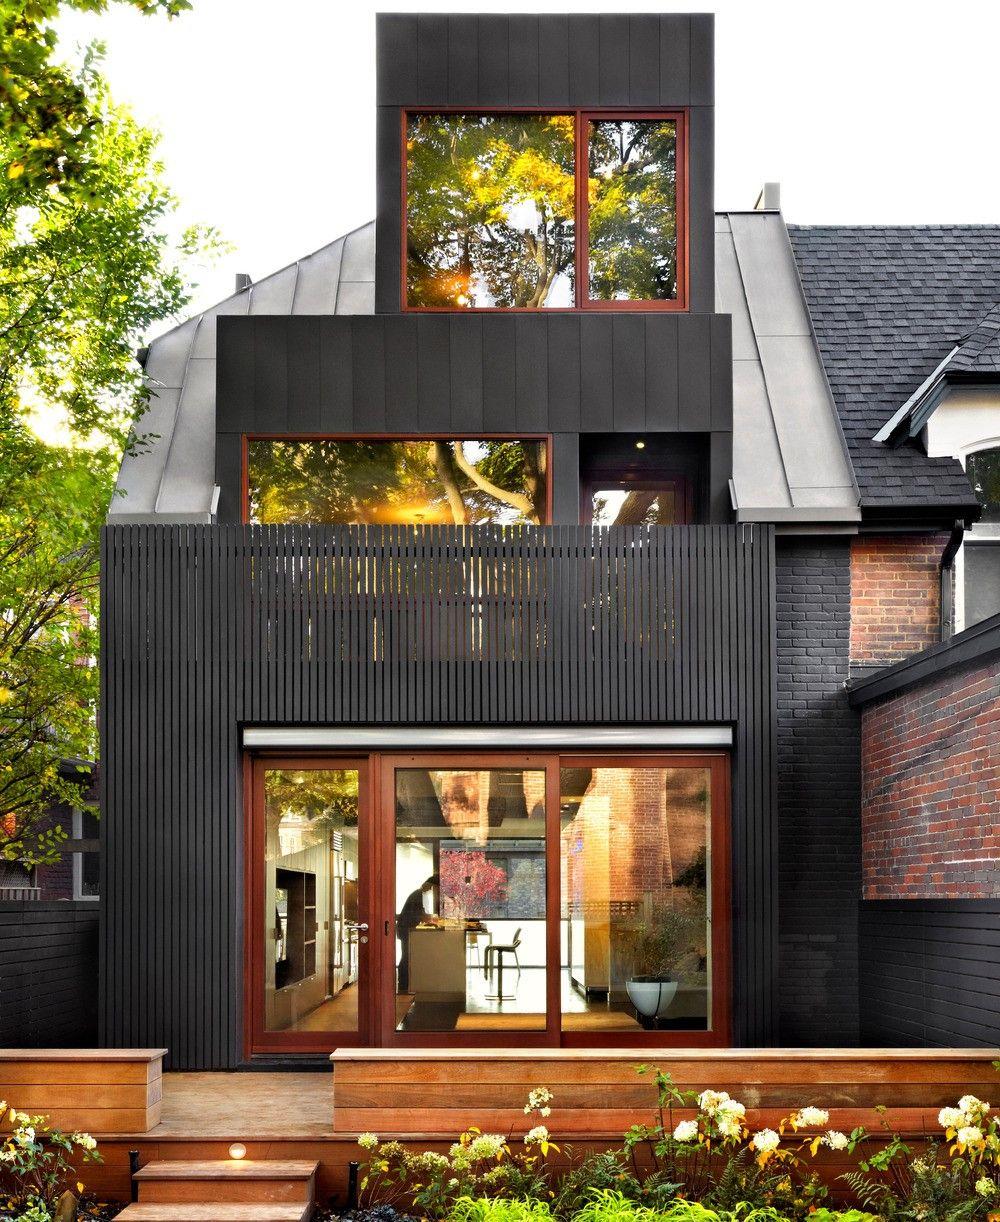 zn house by tongtong myhouseidea tiny house en 2019. Black Bedroom Furniture Sets. Home Design Ideas